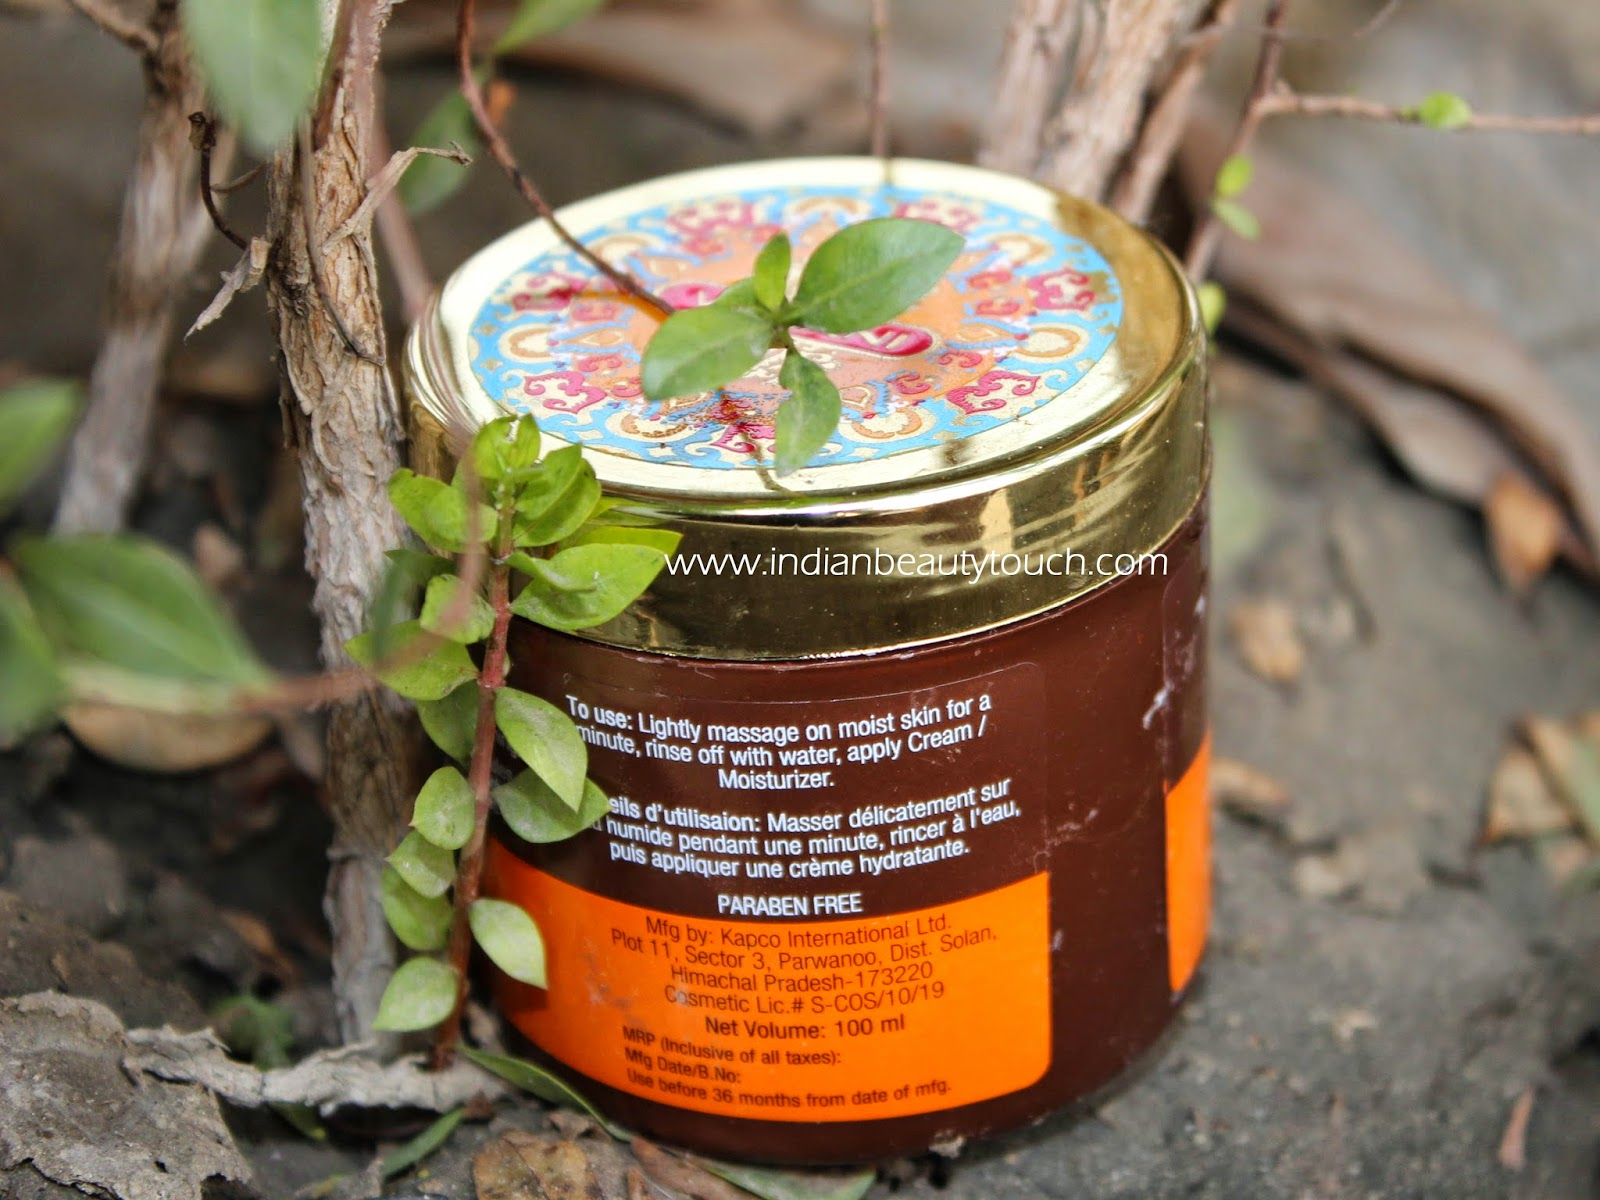 Inveda Avocado Face Scrub Review, Inveda Avocado Face Scrub india, Ayurvedic skin care products, ayurvedic scrub, affordable skin care products in india, Face scrub for indian skin